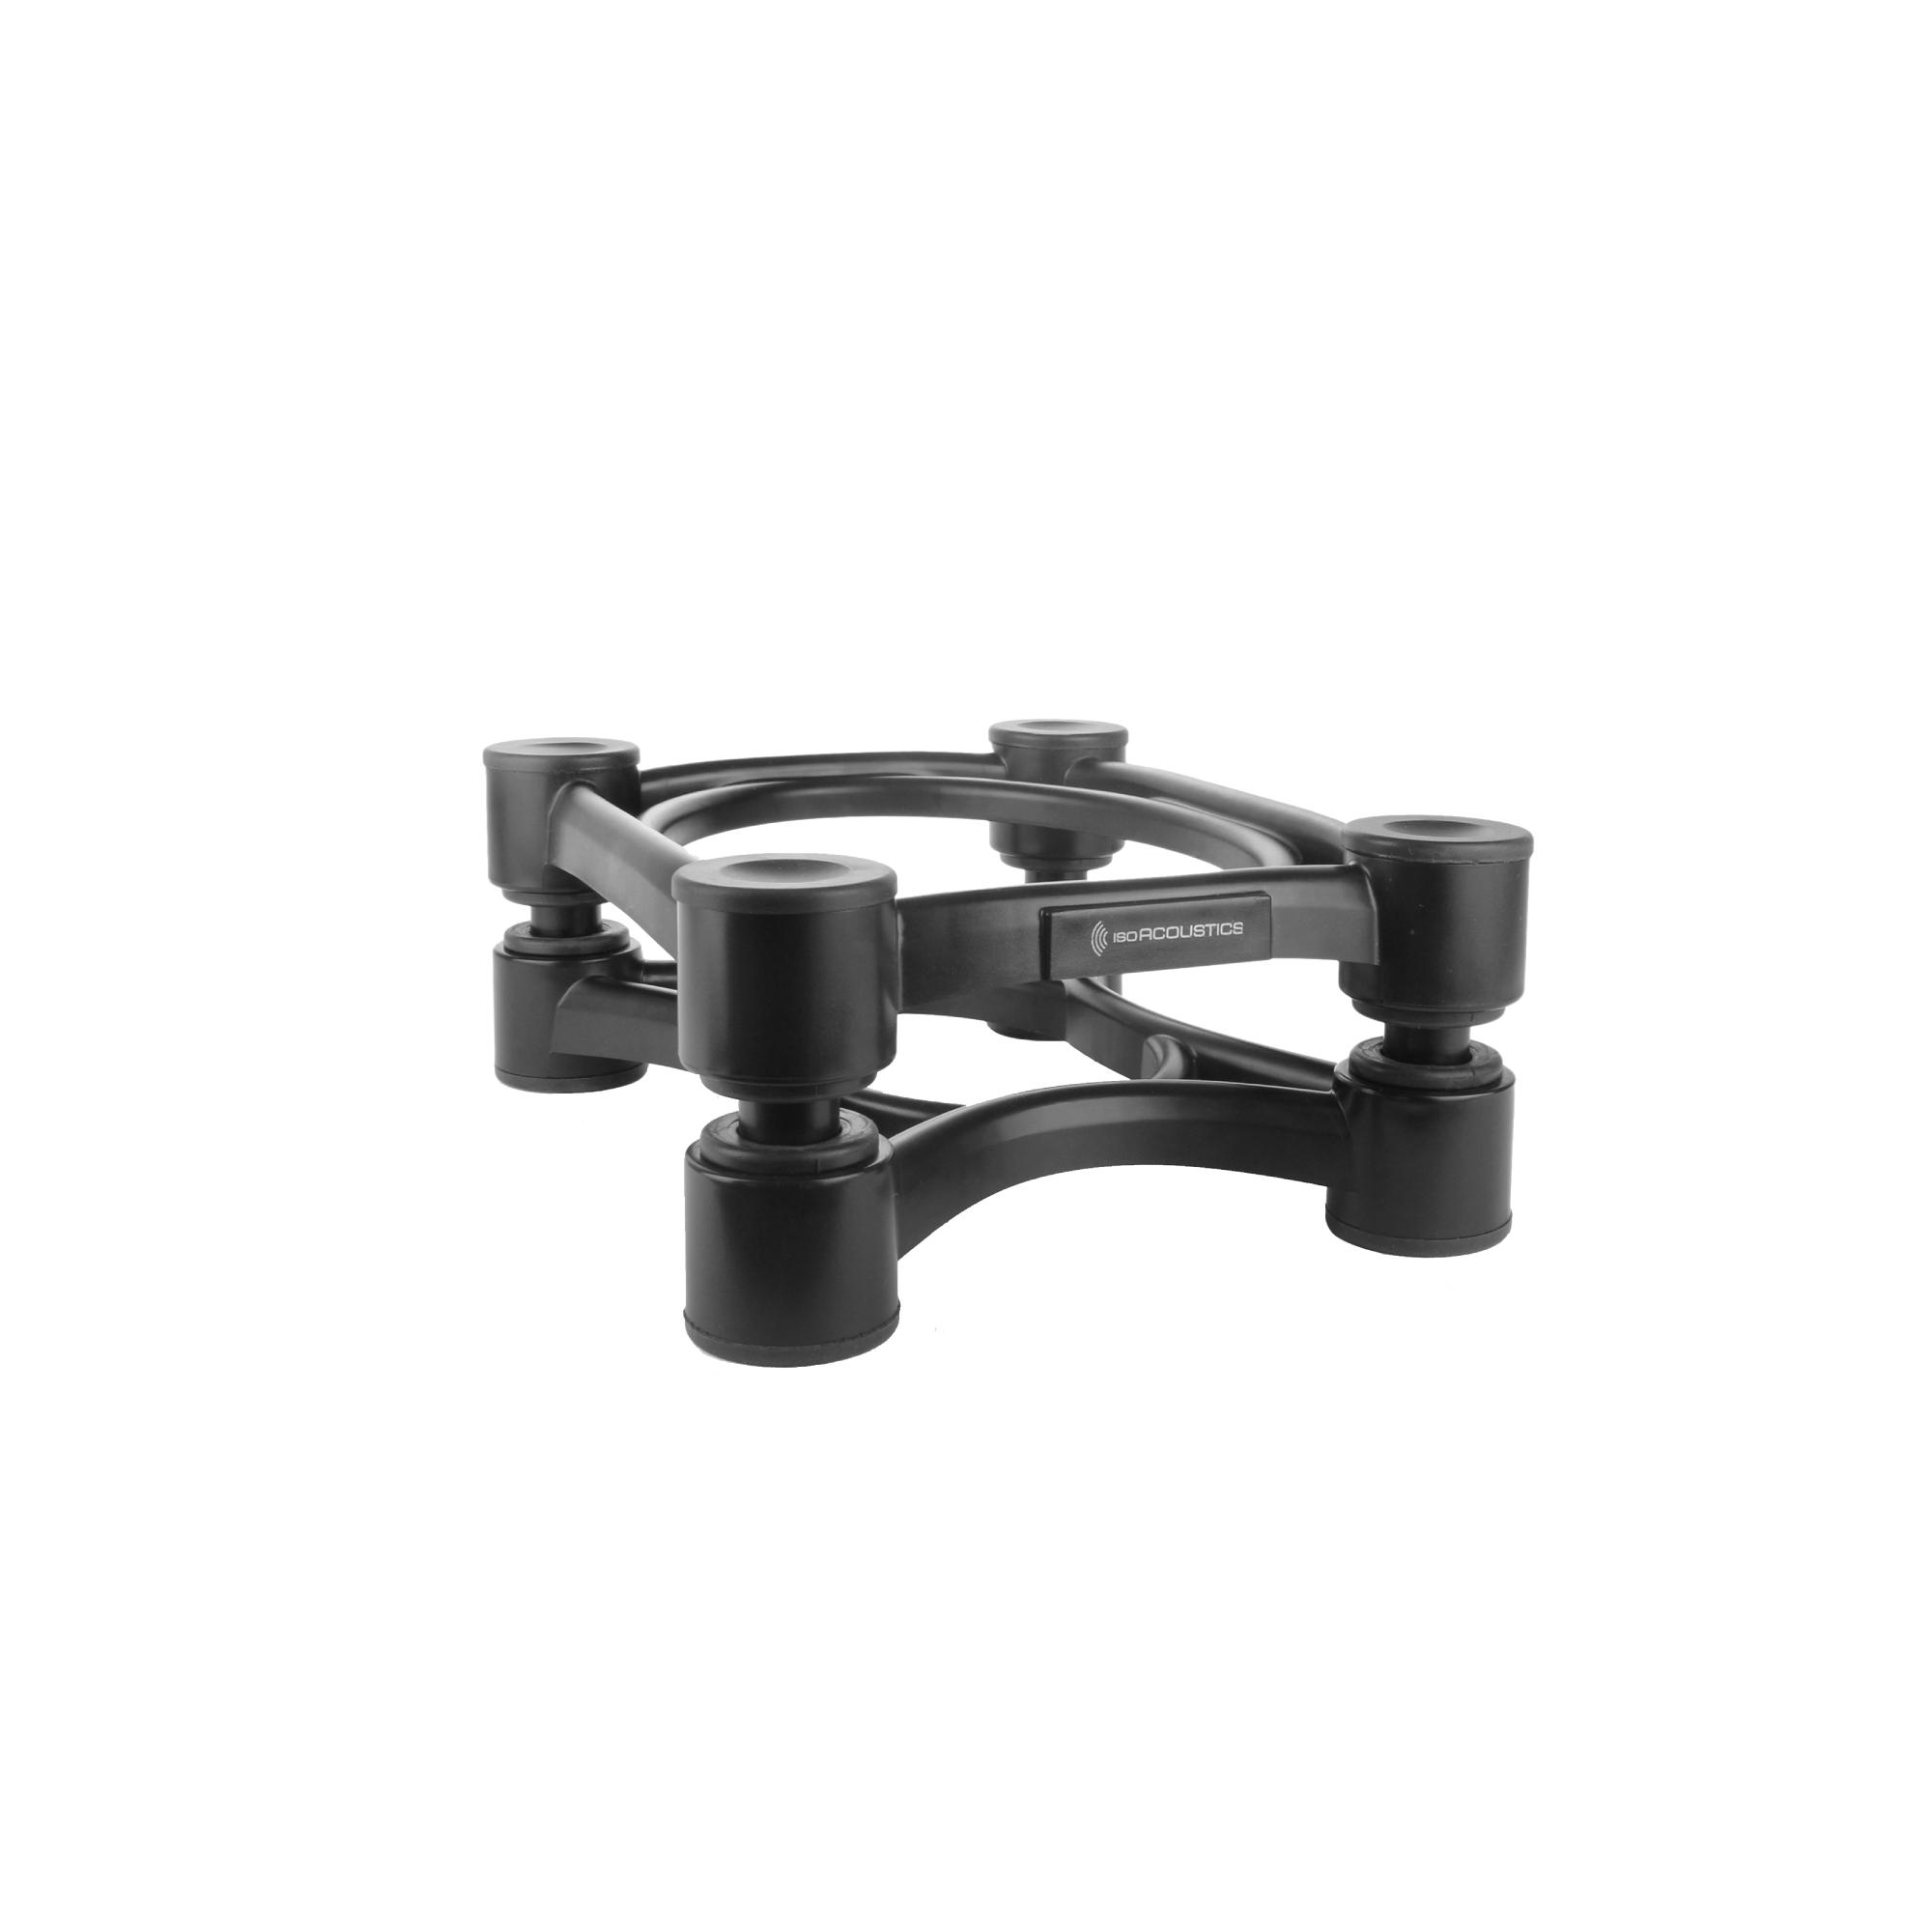 ISO Acoustics スピーカースタンド ISO-200sub (1本) 【送料無料】